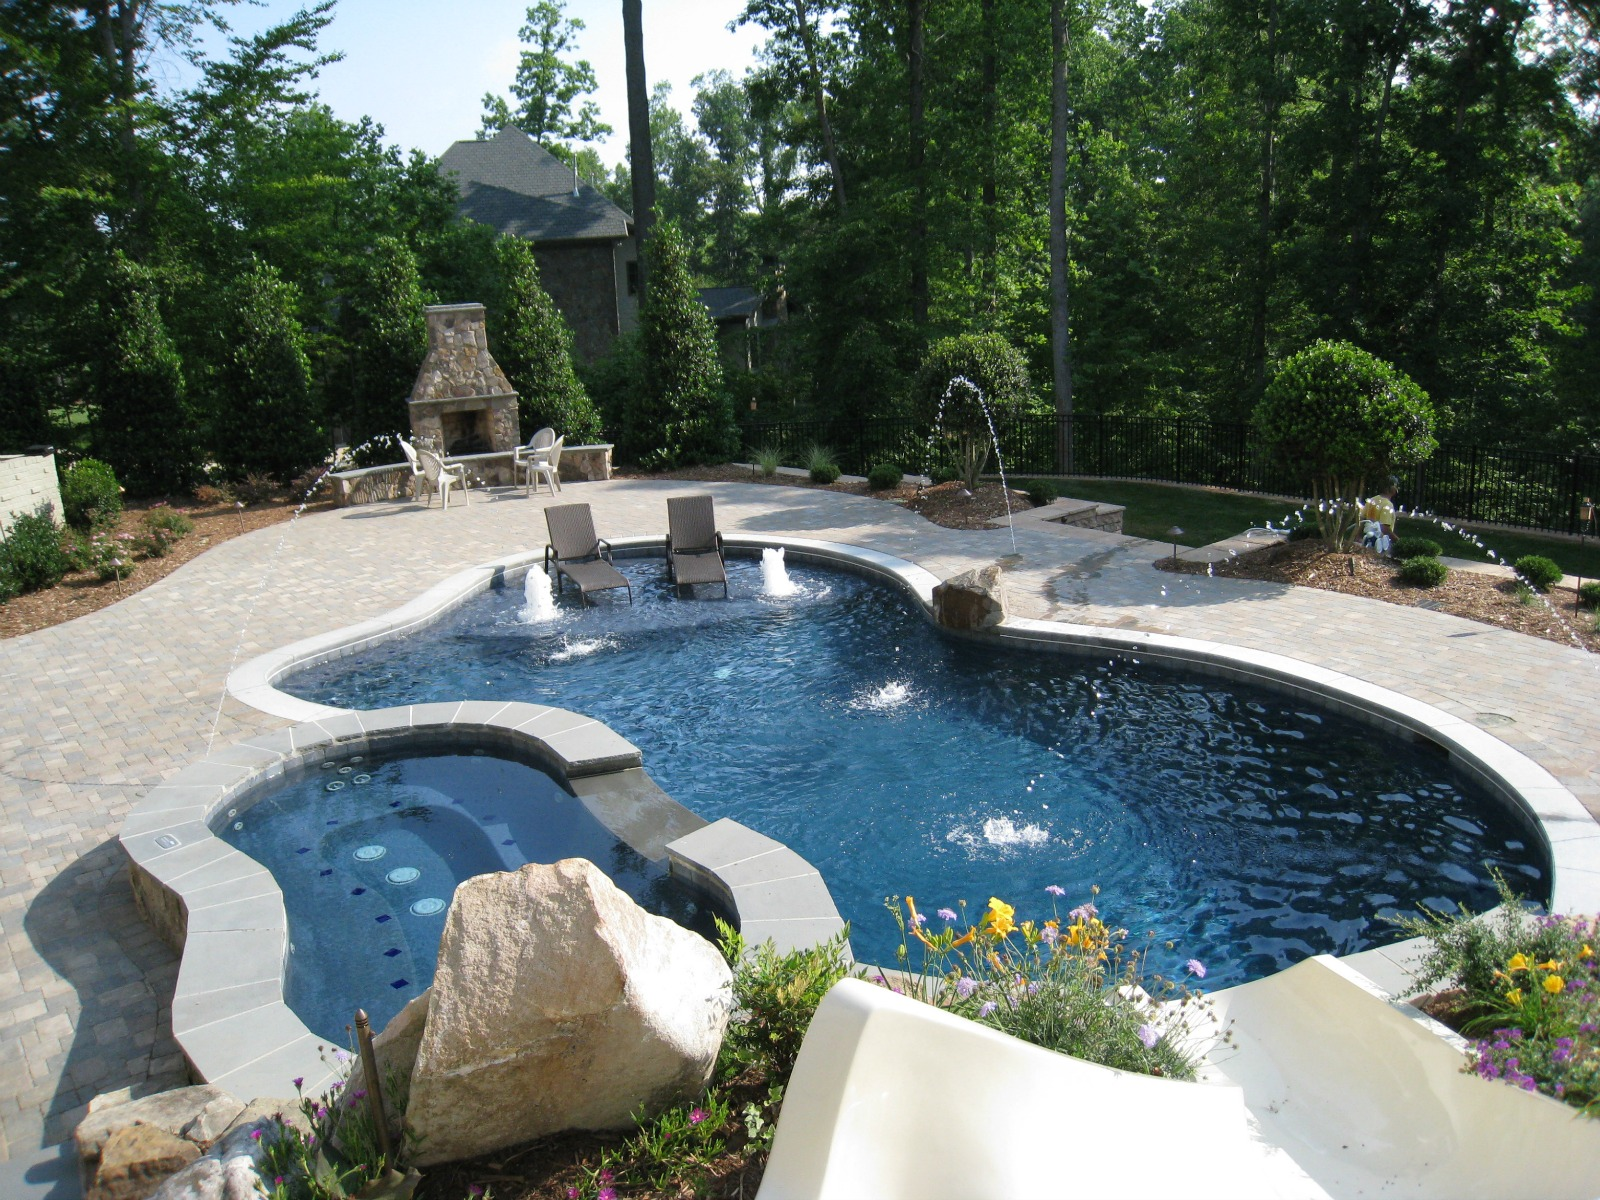 Home- Backyard Oasis Pools- High Quality Pool Installation ...